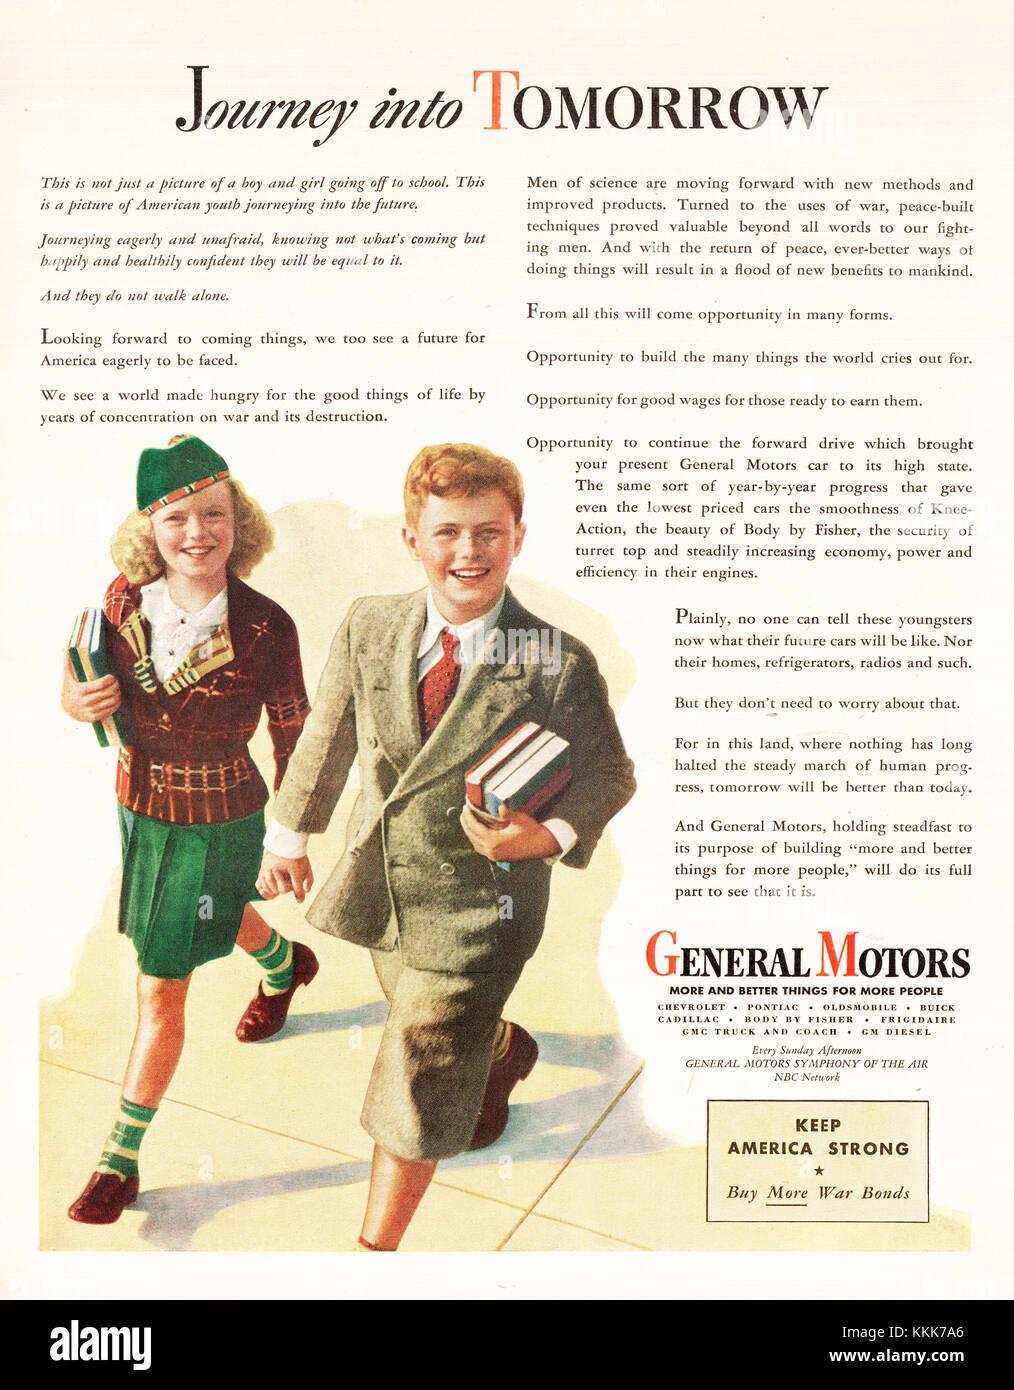 1945 U.S. Magazine General Motors Advert - Stock Image